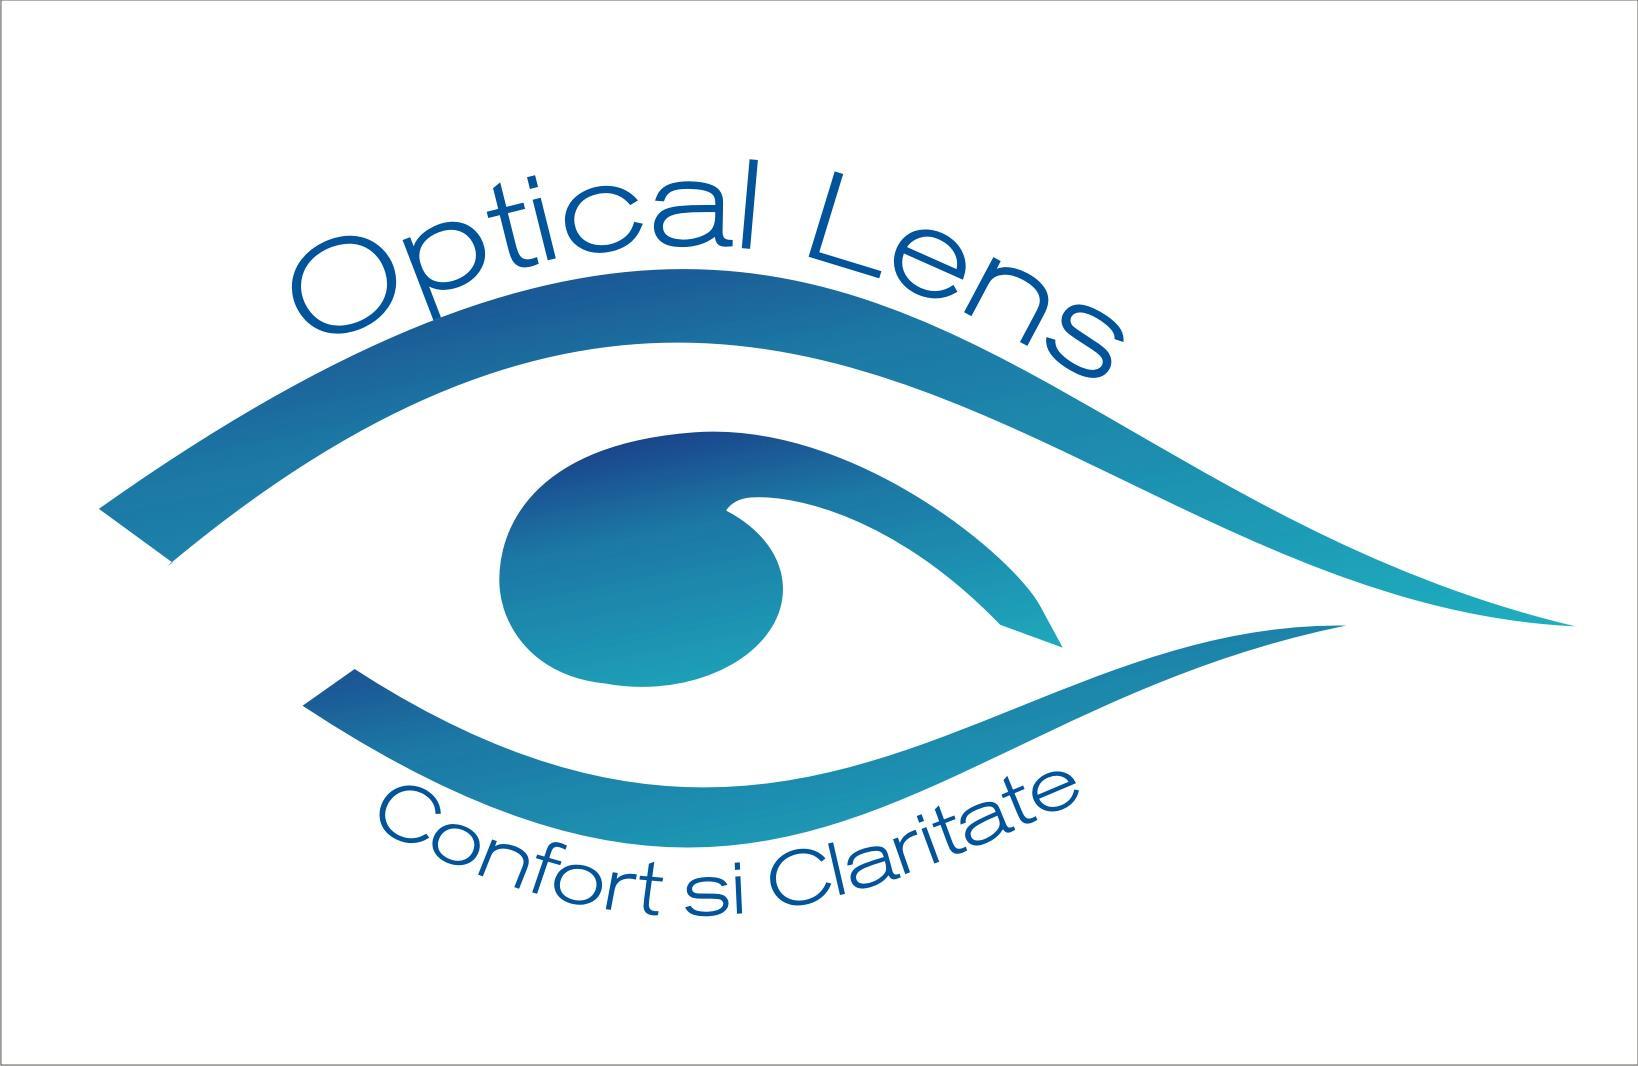 Optical Lens Adriane - Curtea de Arges